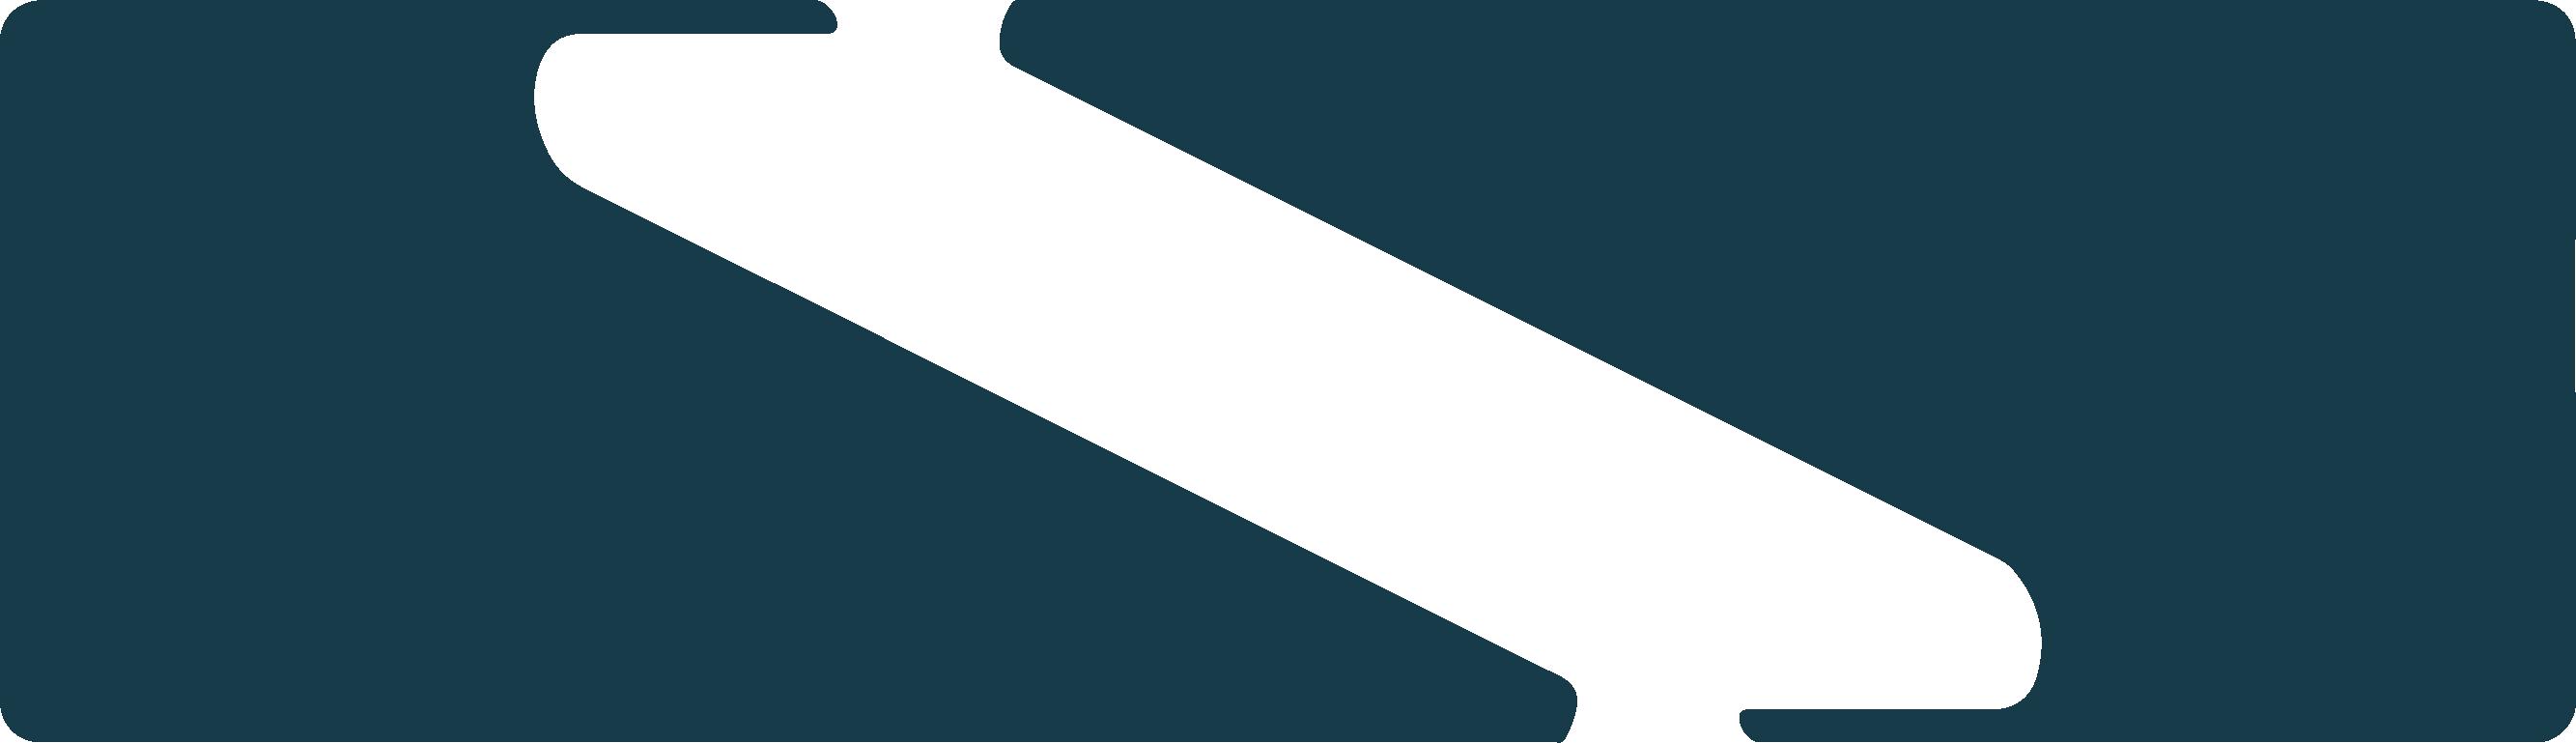 CDDL Logo navy